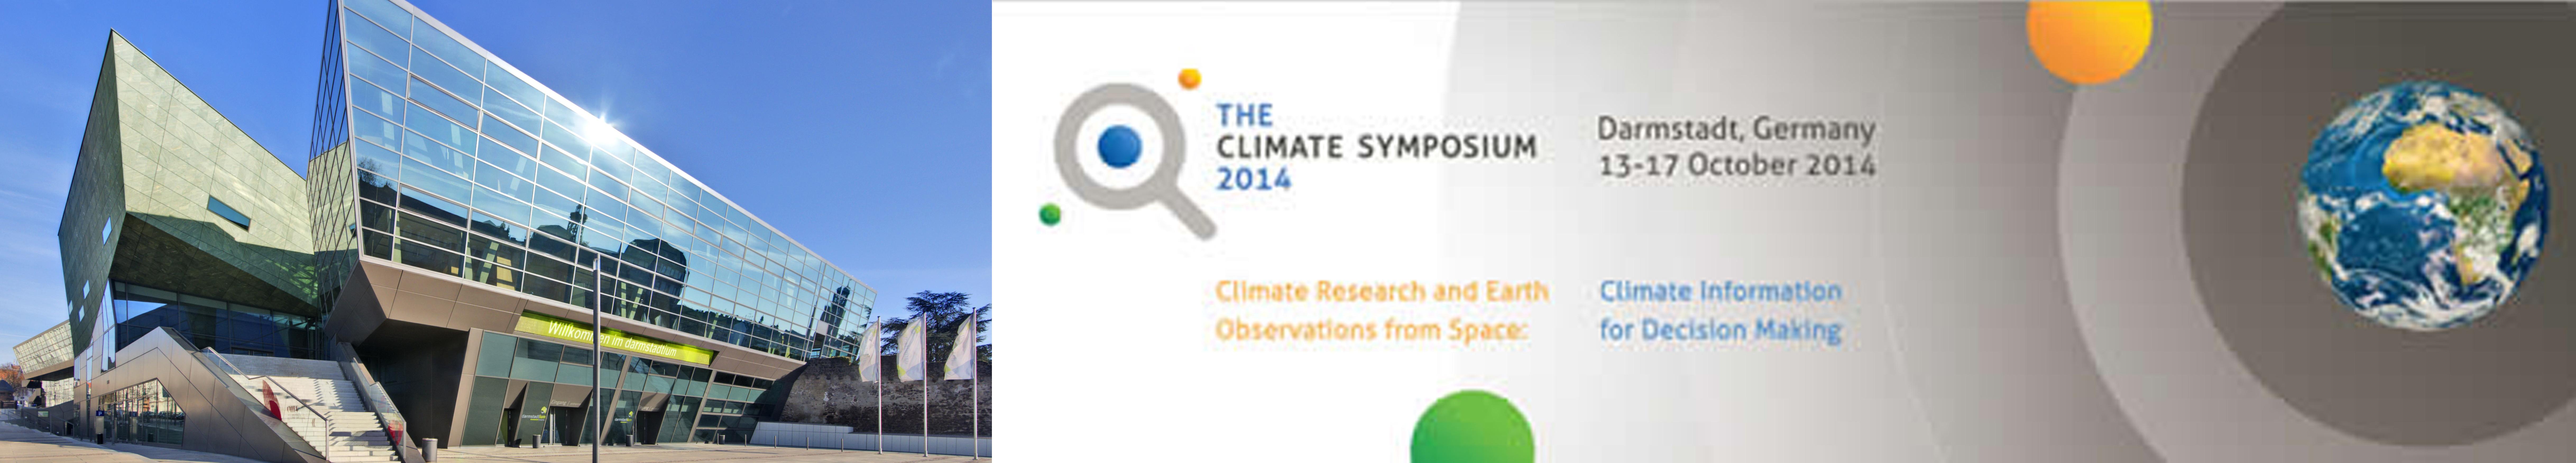 darmstadt climate symposium 2014